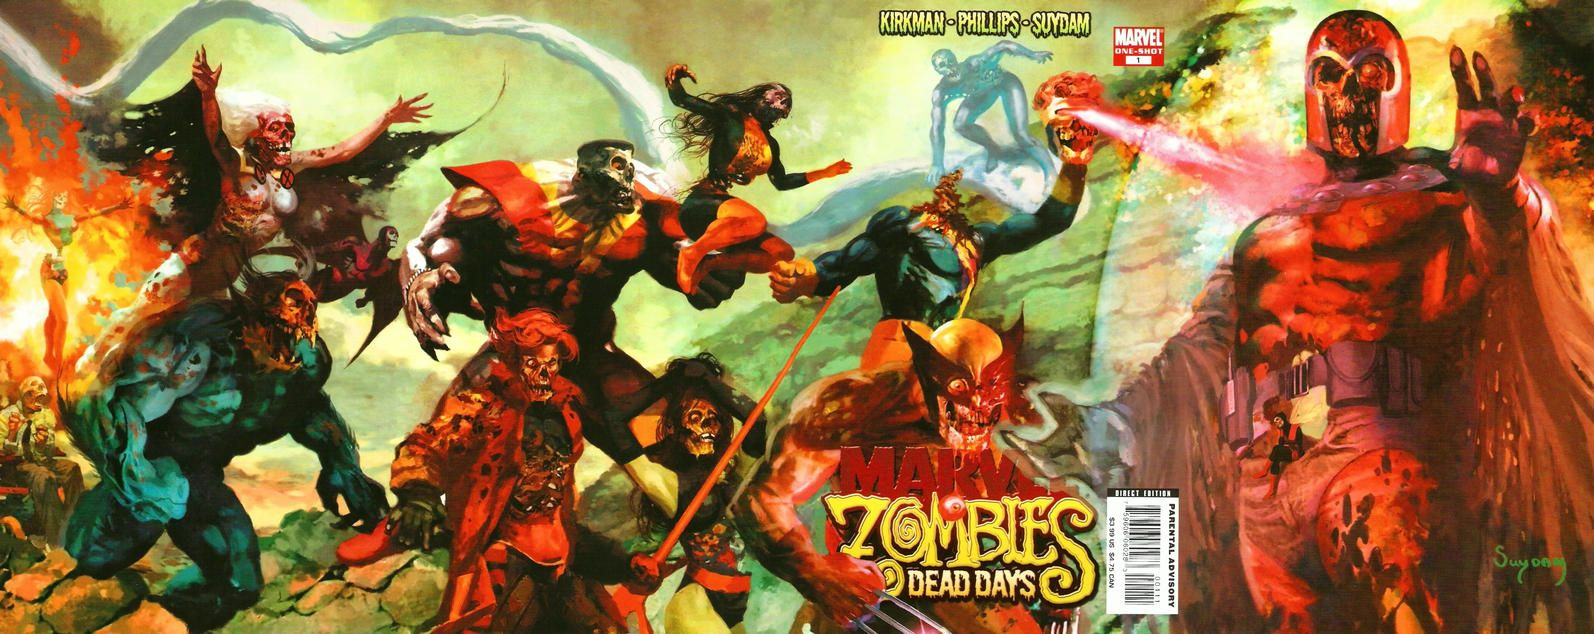 Gcd cover marvel zombies dead days 1 marvel